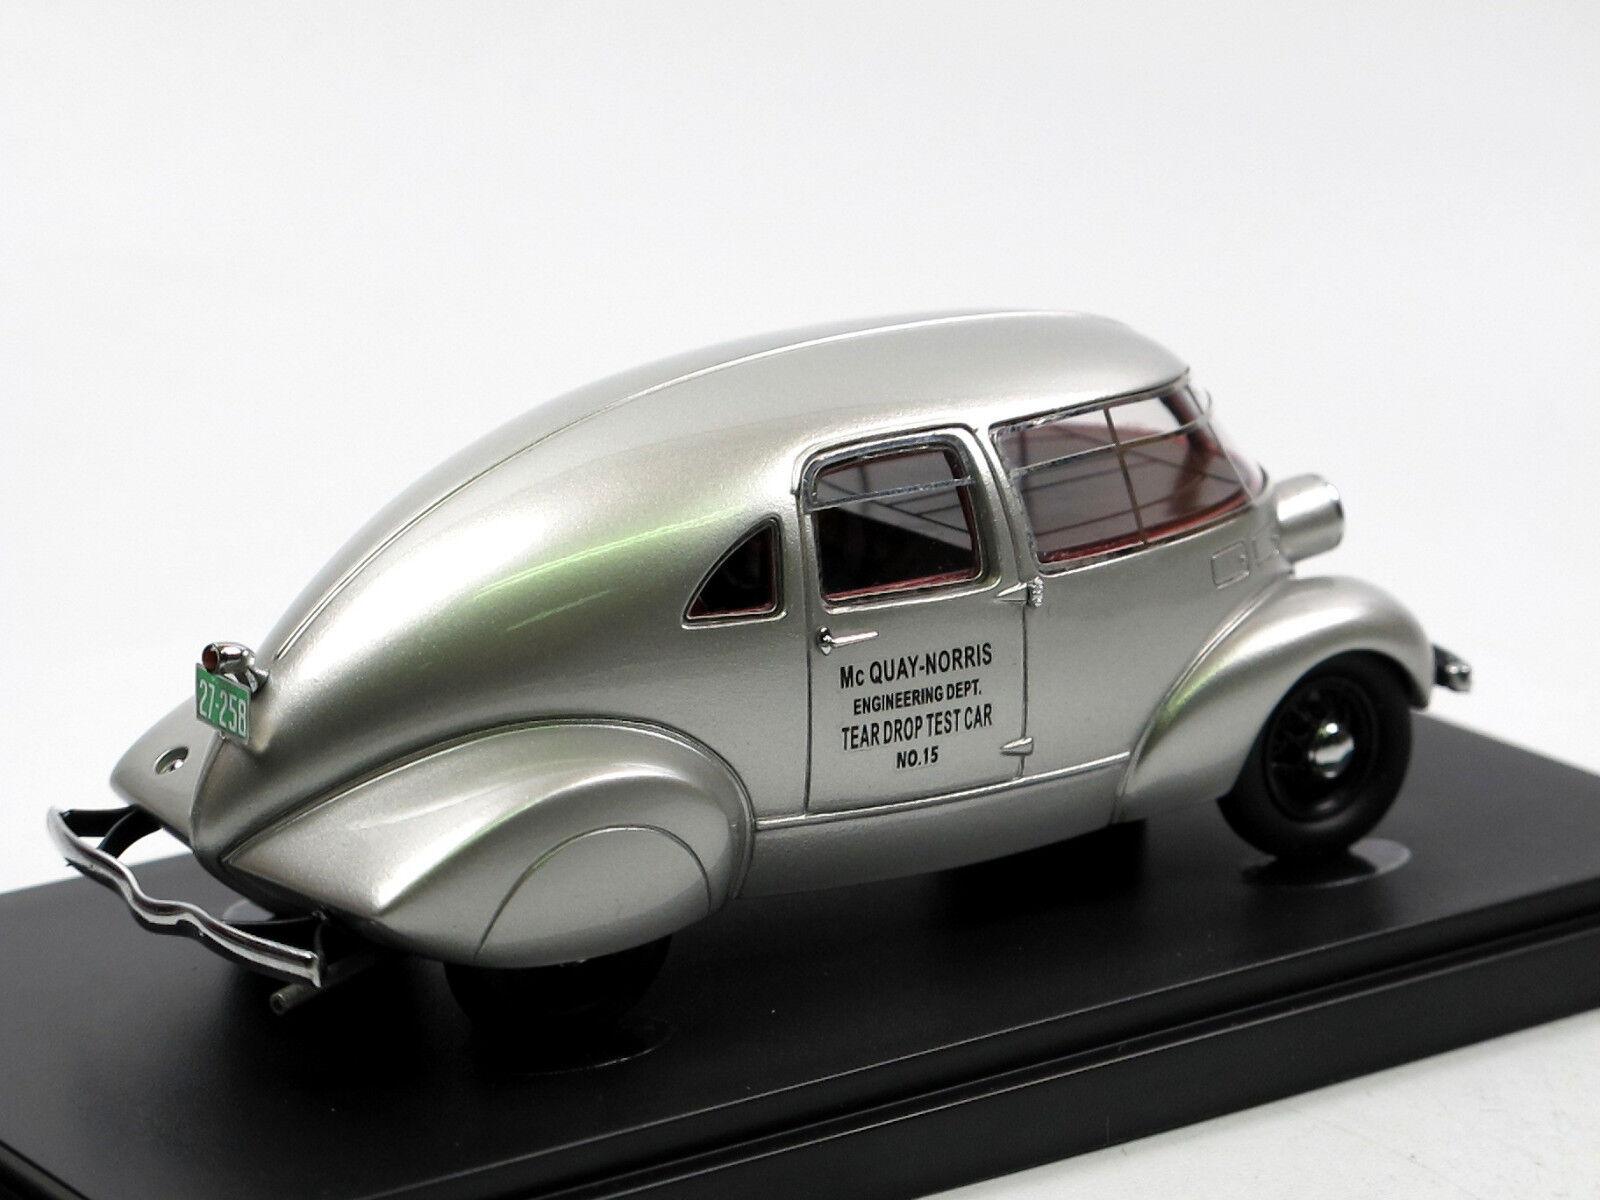 Autocult 04007 1934 McQUAY-NORRIS Streamliner Aluminium Egg Egg Egg 1 43 TEST CAR 217d05